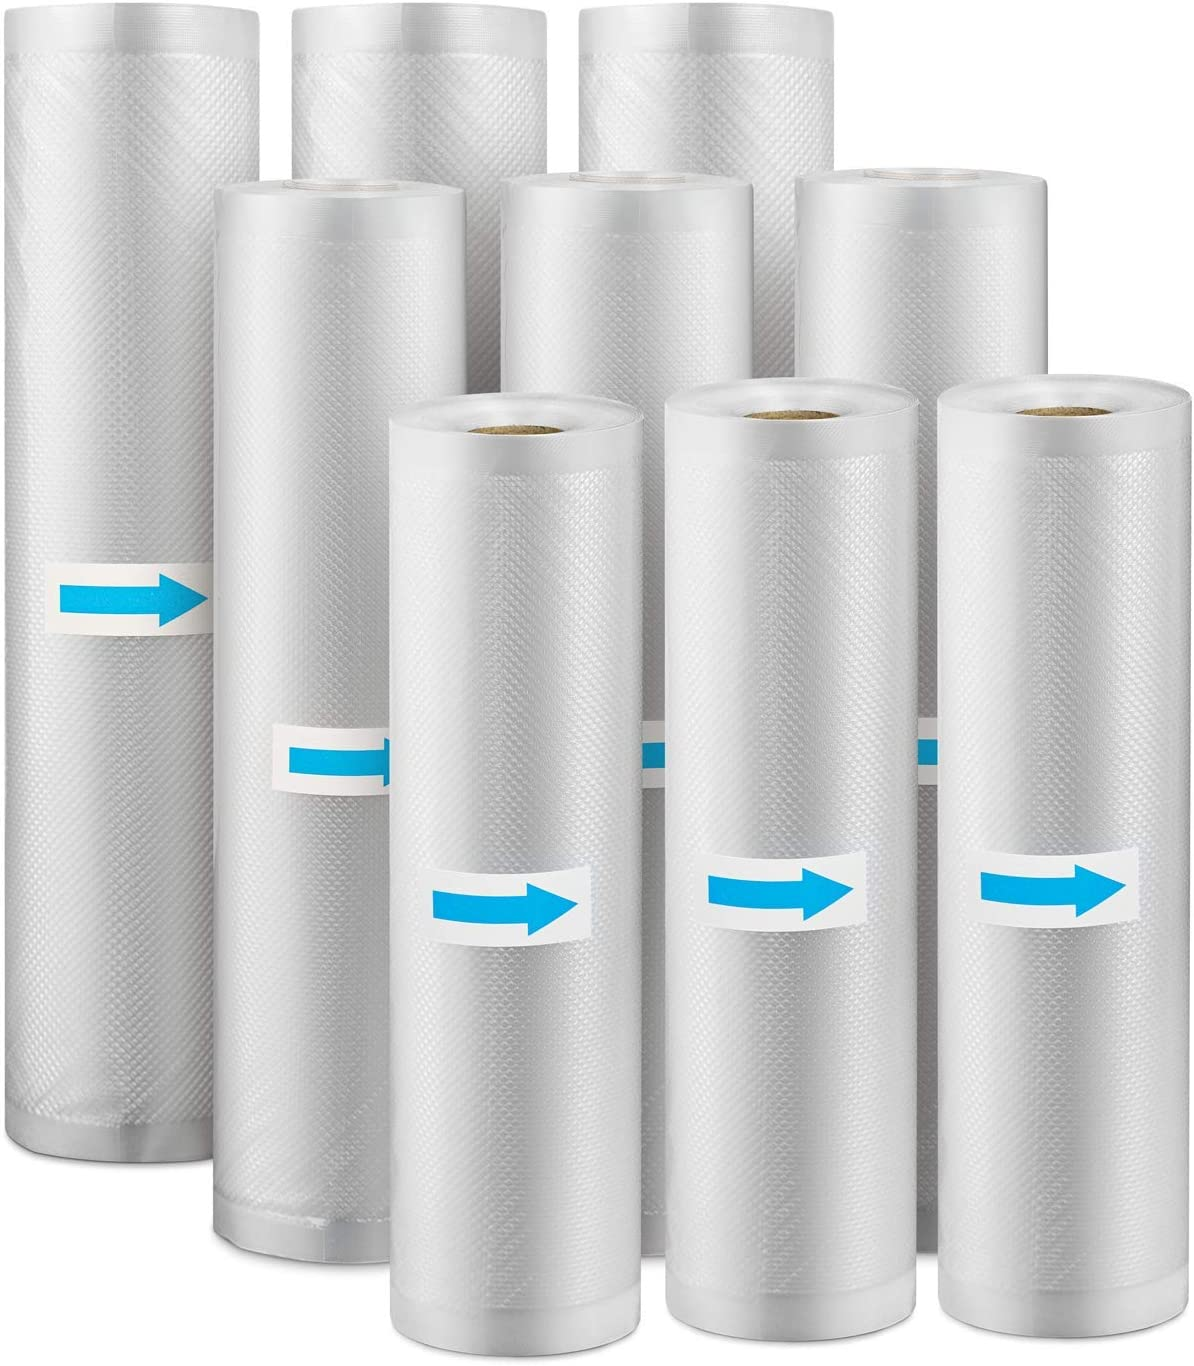 Gibot Vacuum Sealer Bags for Food 9 Rolls Premium Reusable Food Saver Vacuum Sealer Bags Rolls with BPA Free for All Vacuum Sealer Machine, 8